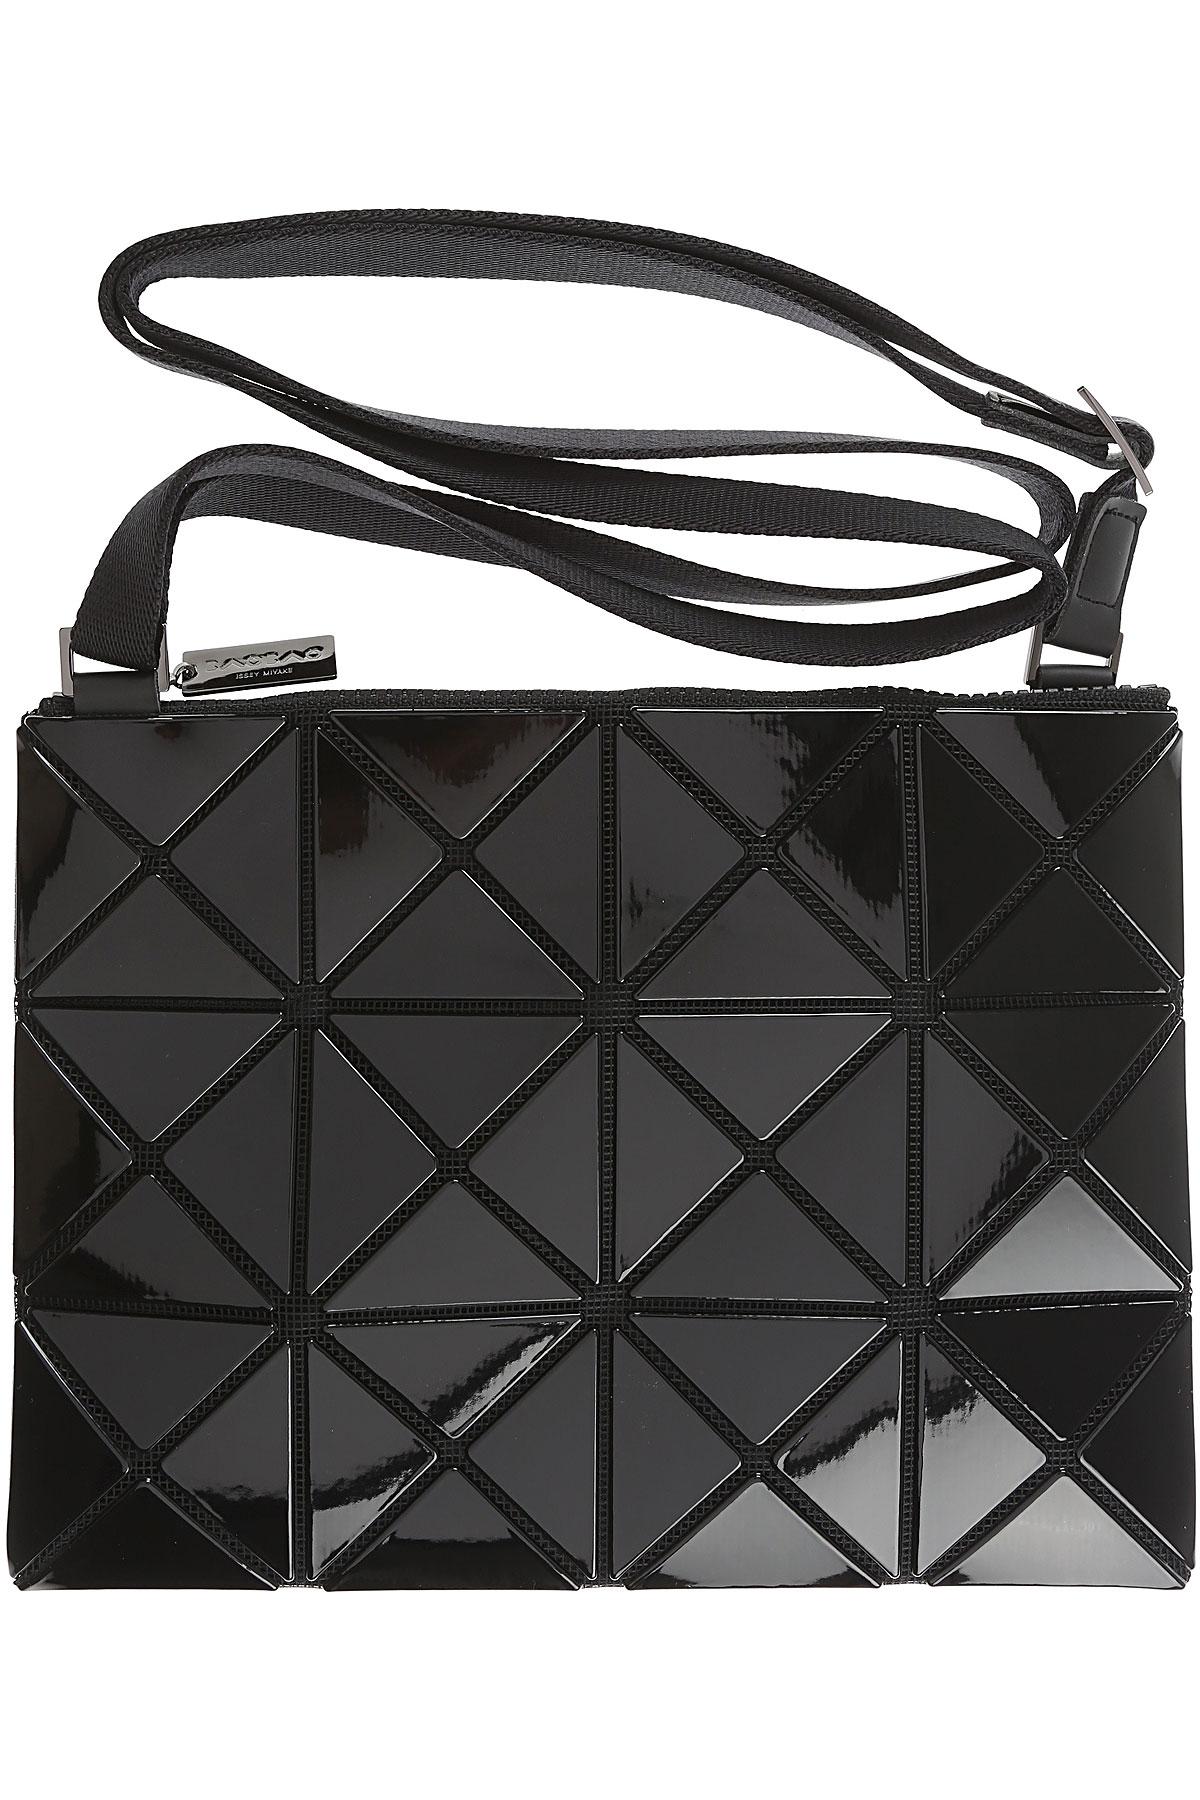 Image of Issey Miyake Shoulder Bag for Women, Bao Bao, Black, polyester, 2017